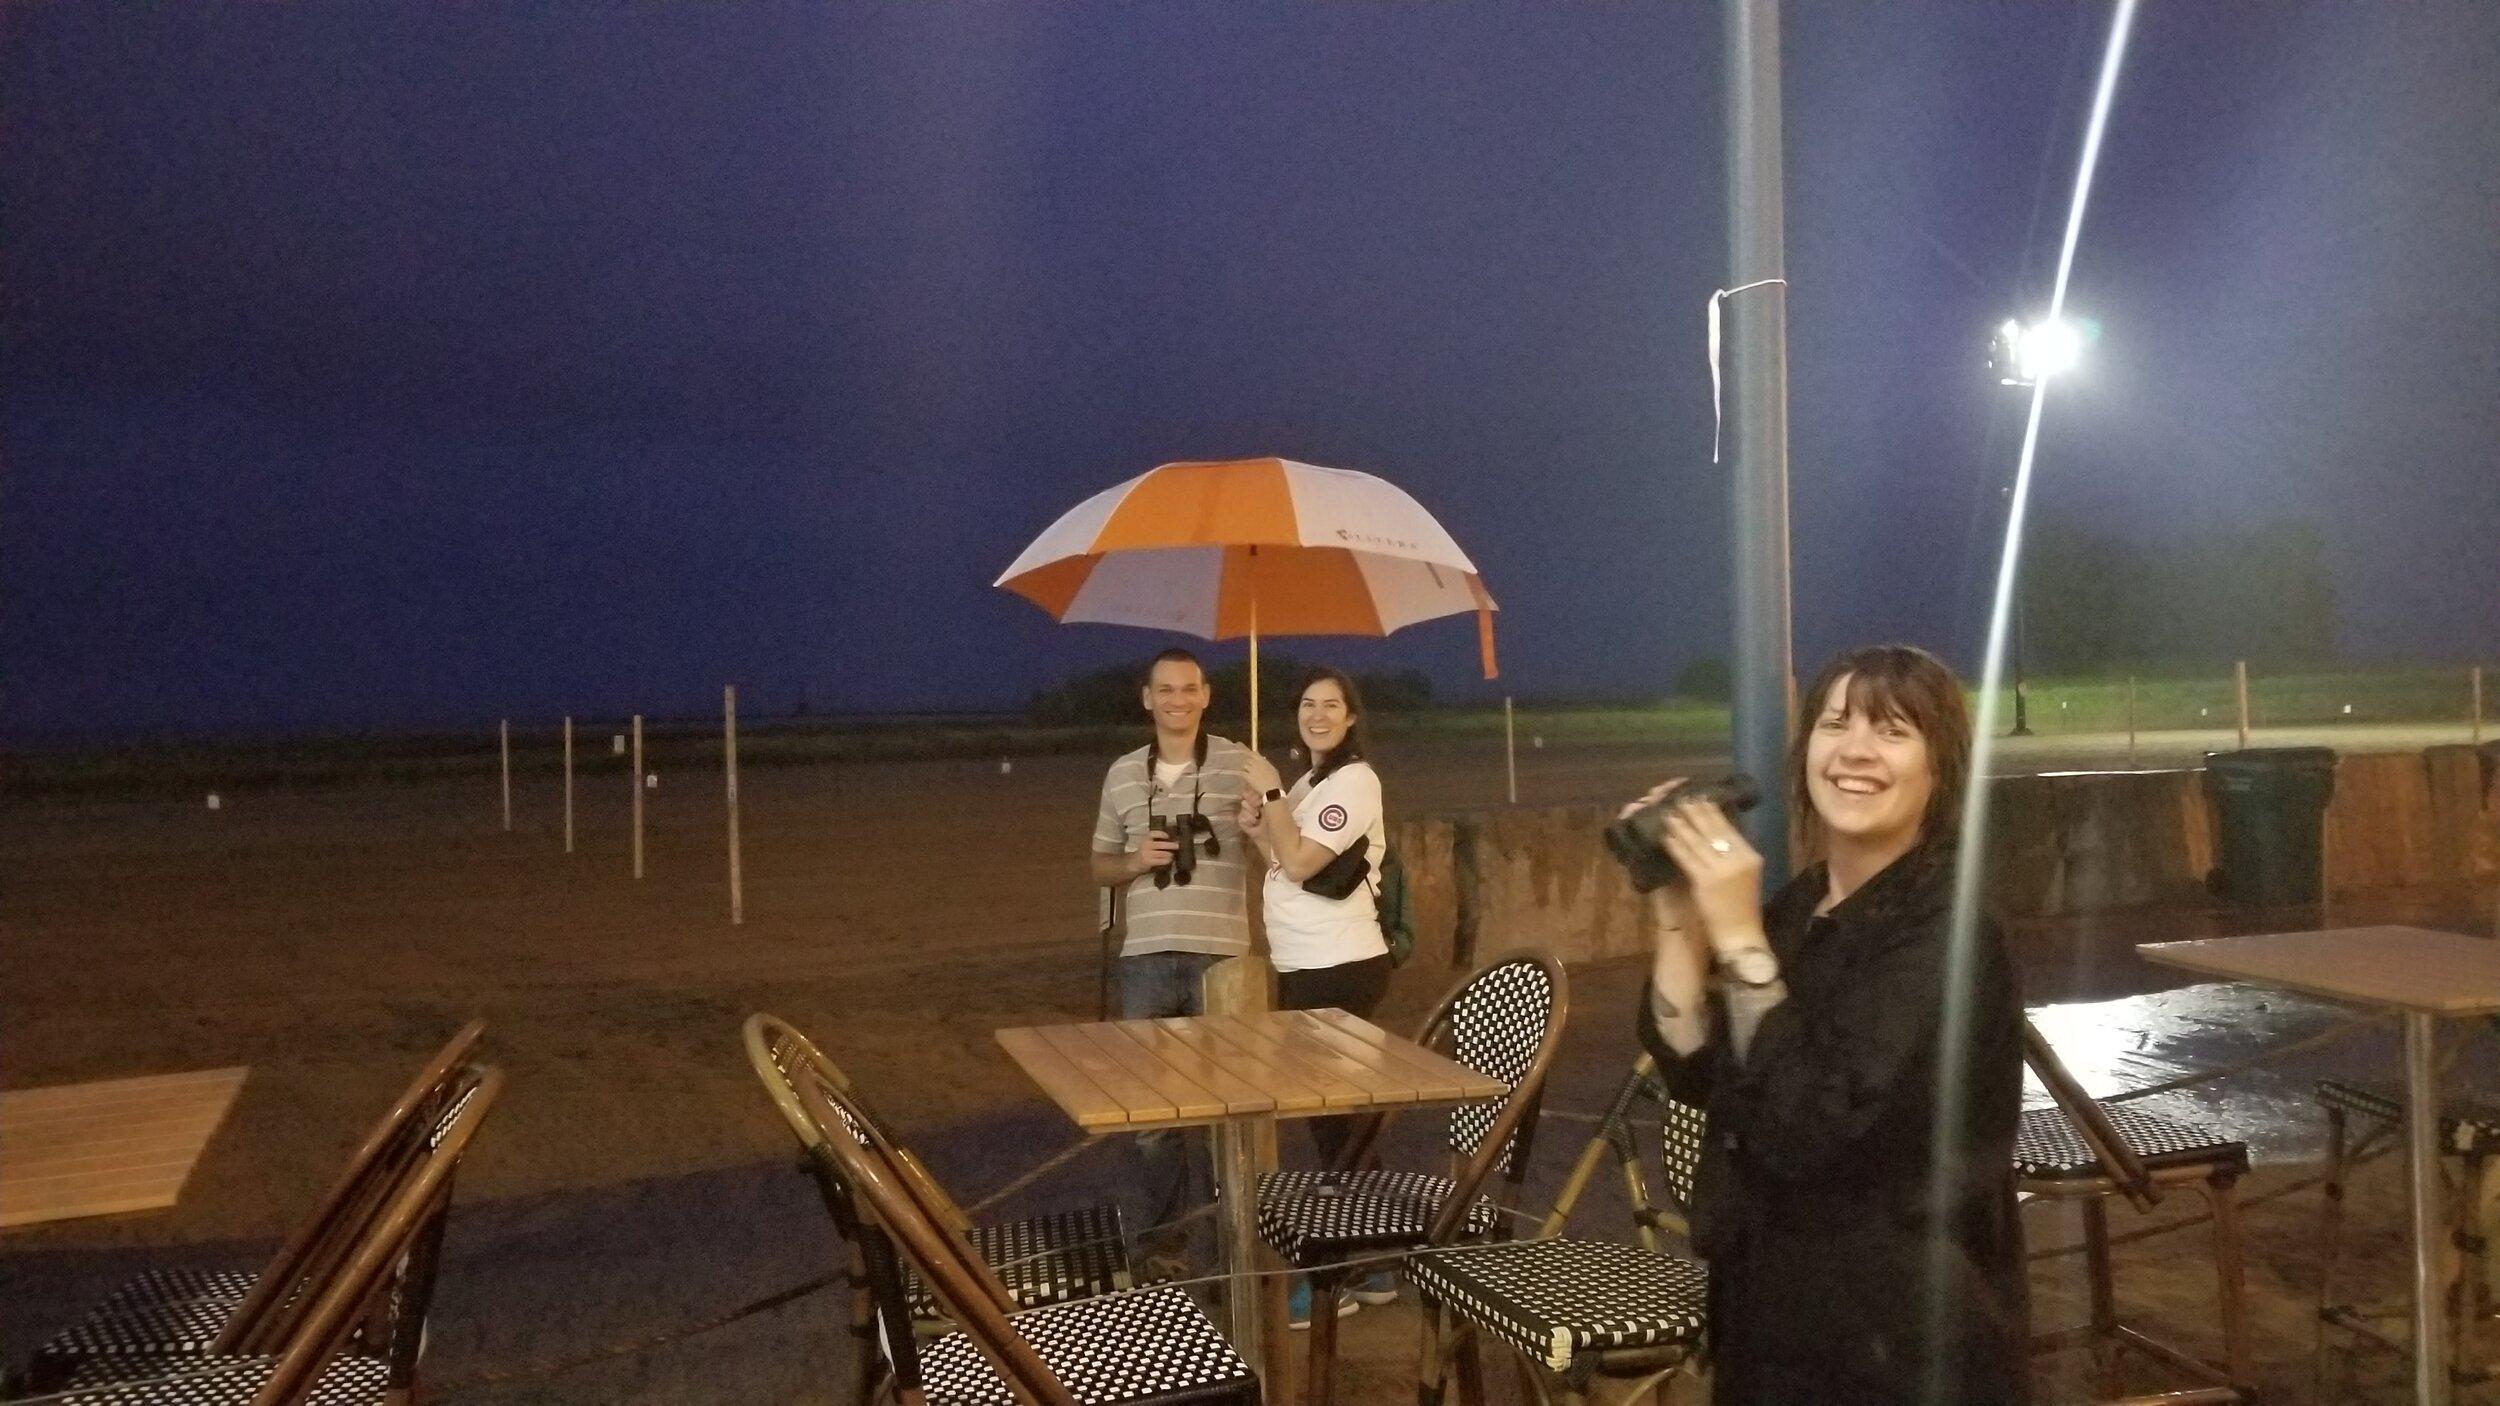 #ploverwatch volunteers keeping watch in spite of rainy skies Photo: Edward Warden